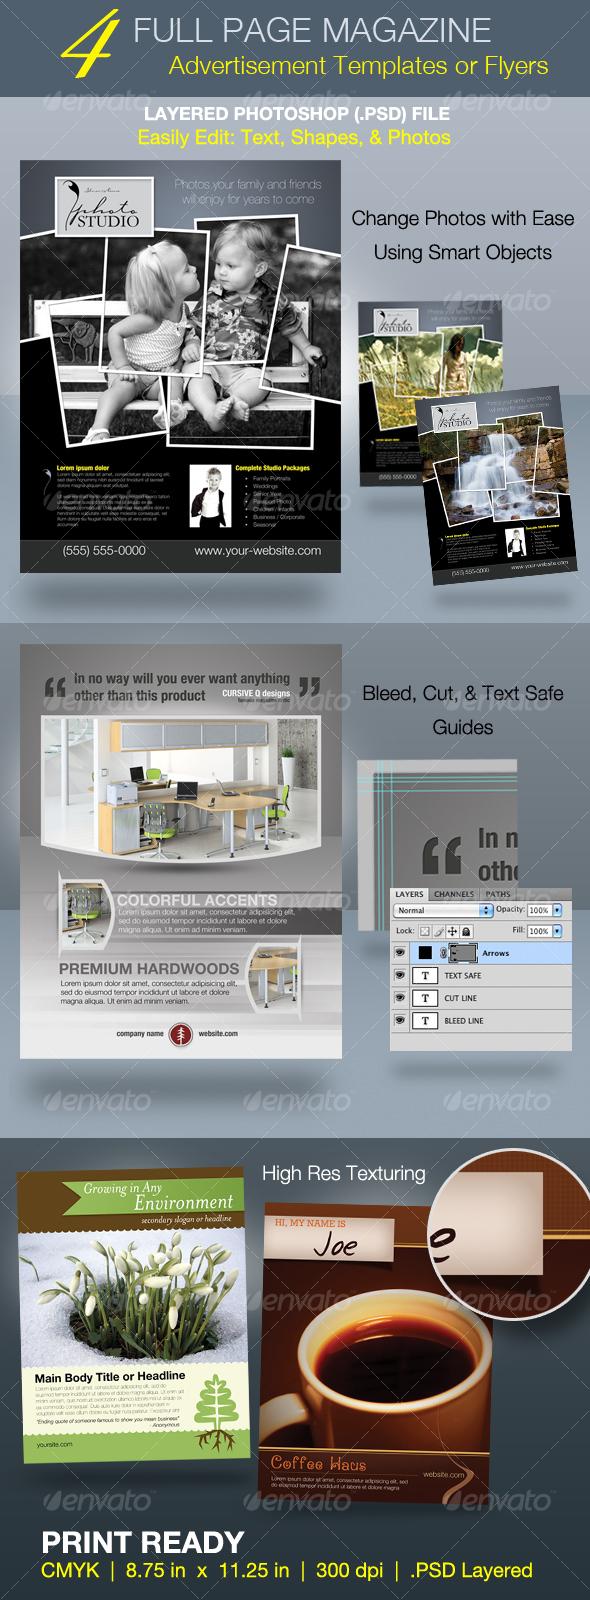 Creative Print Templates September 2012